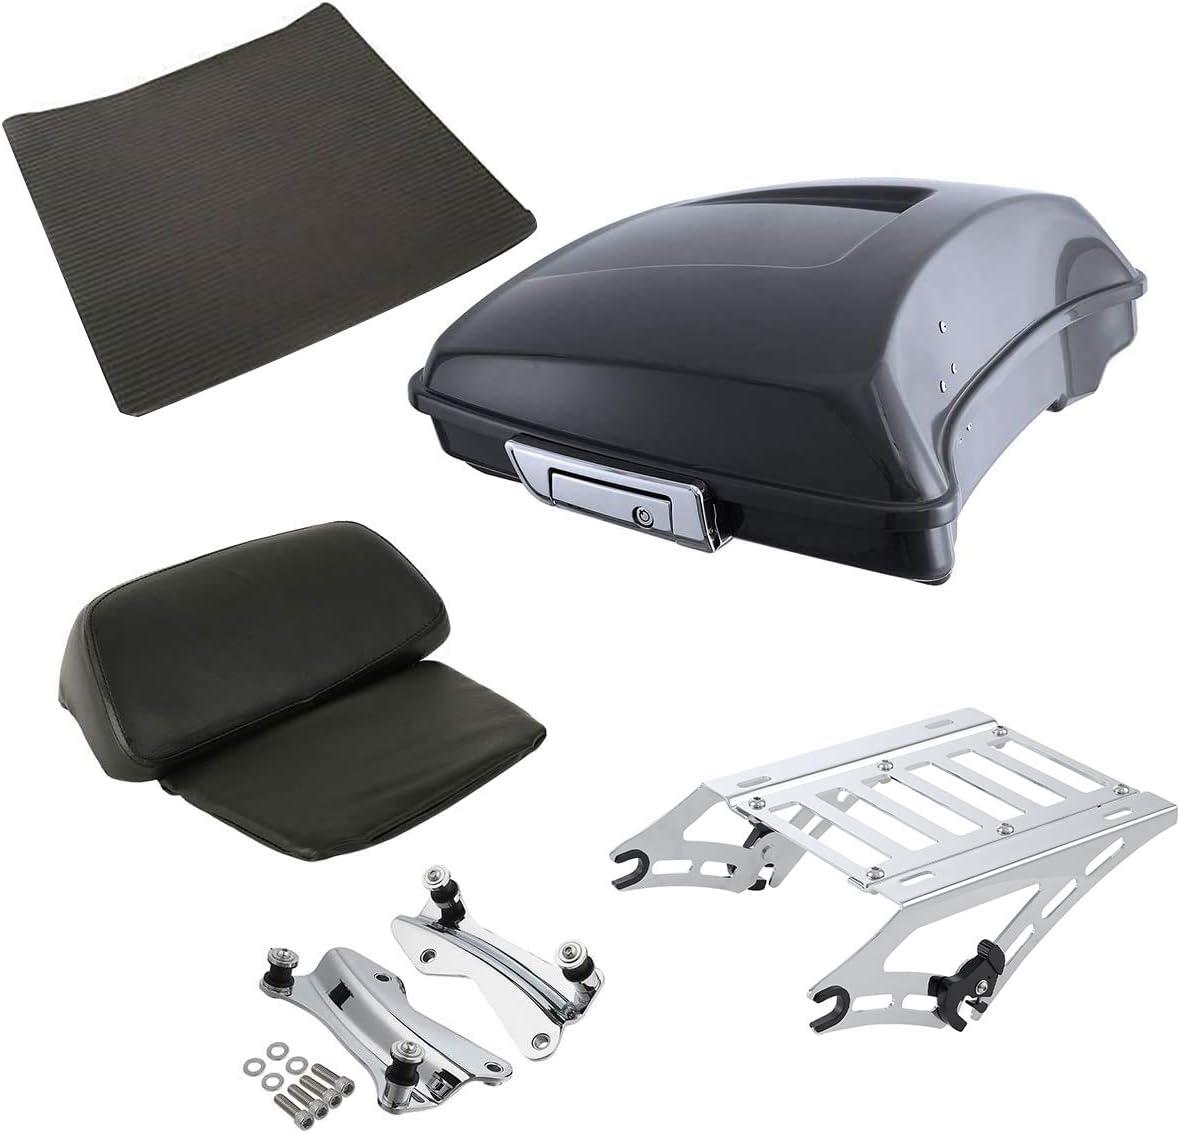 SLMOTO 5.5 ABS Razor Pack Trunk Two Up Mount Rack 4 Point Docking Kit Fit For Harley Tour Pak Street Street Glide FLHX 2014-2020